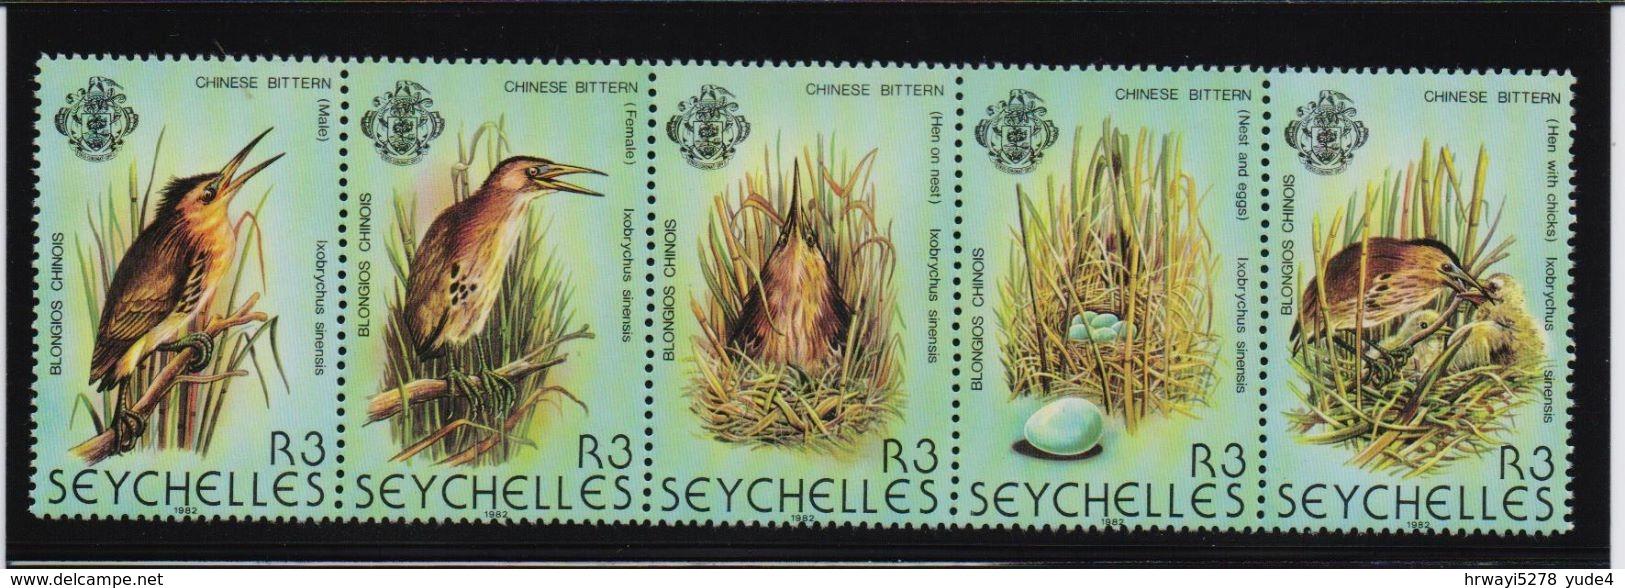 Seychelles 1982, Birds, Complete Set In Strip, MNH. Cv 18 Euro - Seychelles (1976-...)